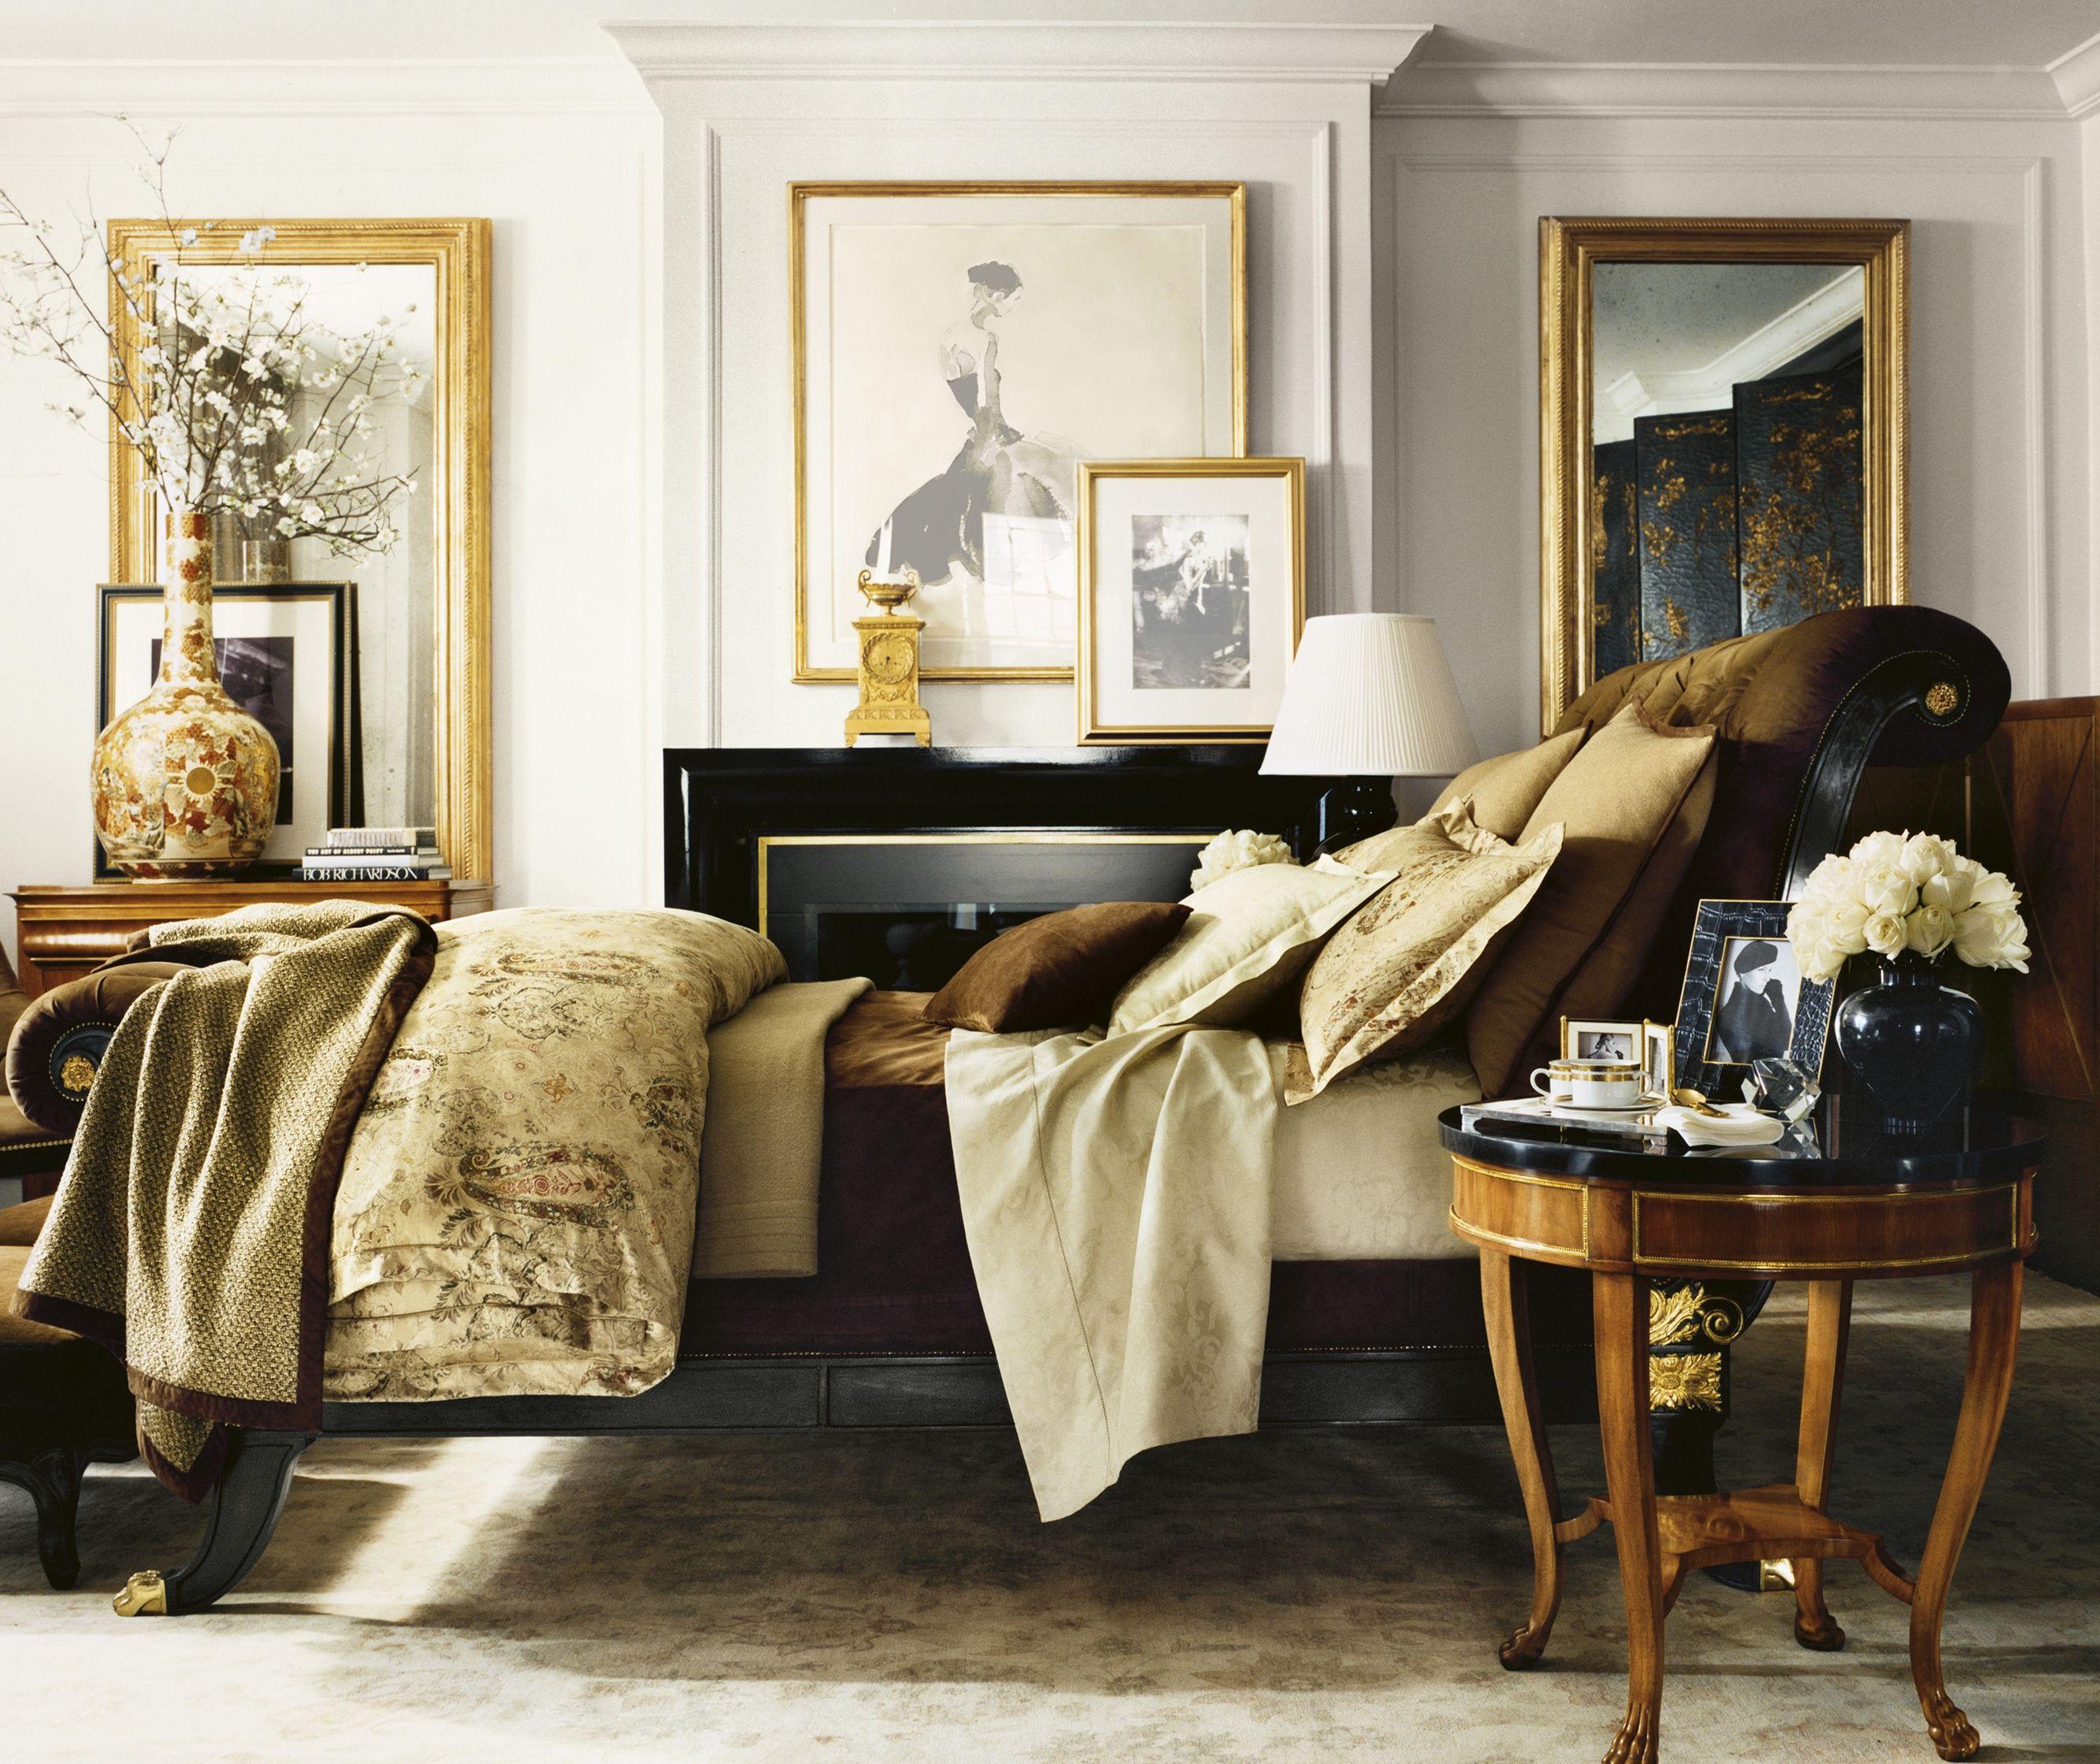 Classic Master Bedroom Paint Color Ideas For 2013: Ralph Lauren Paint Presents A Classic, Rich White Perfect